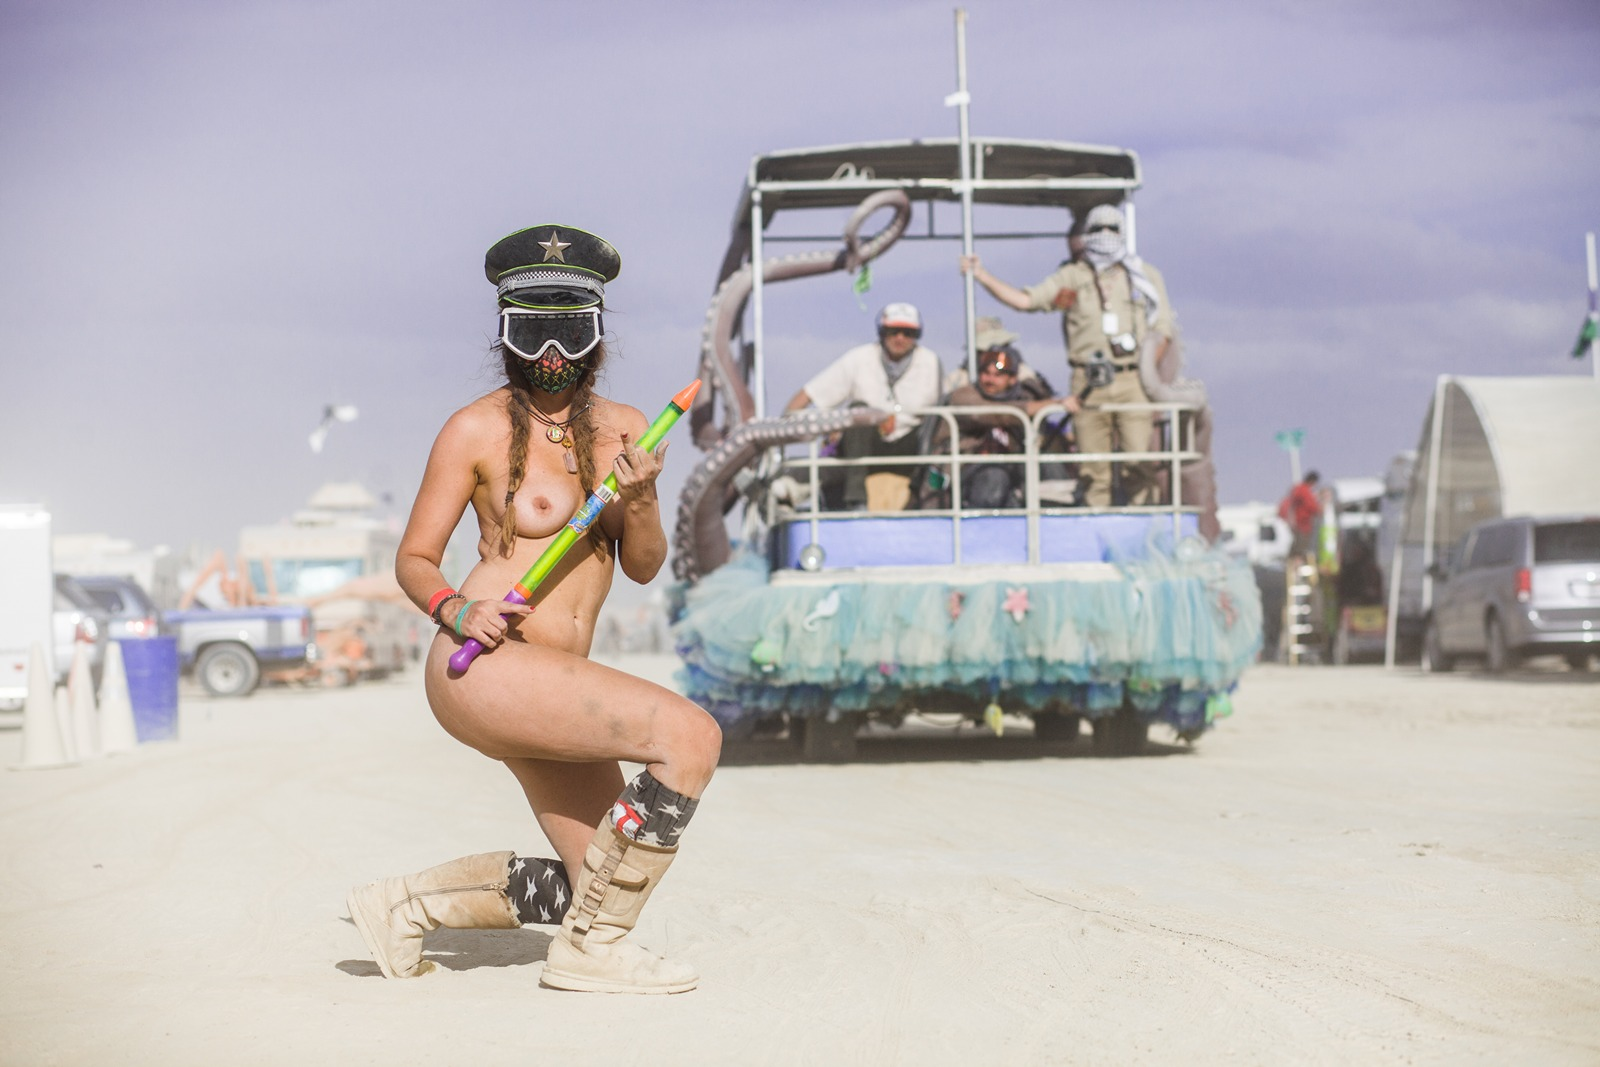 Burning Man - Squirt gun girl